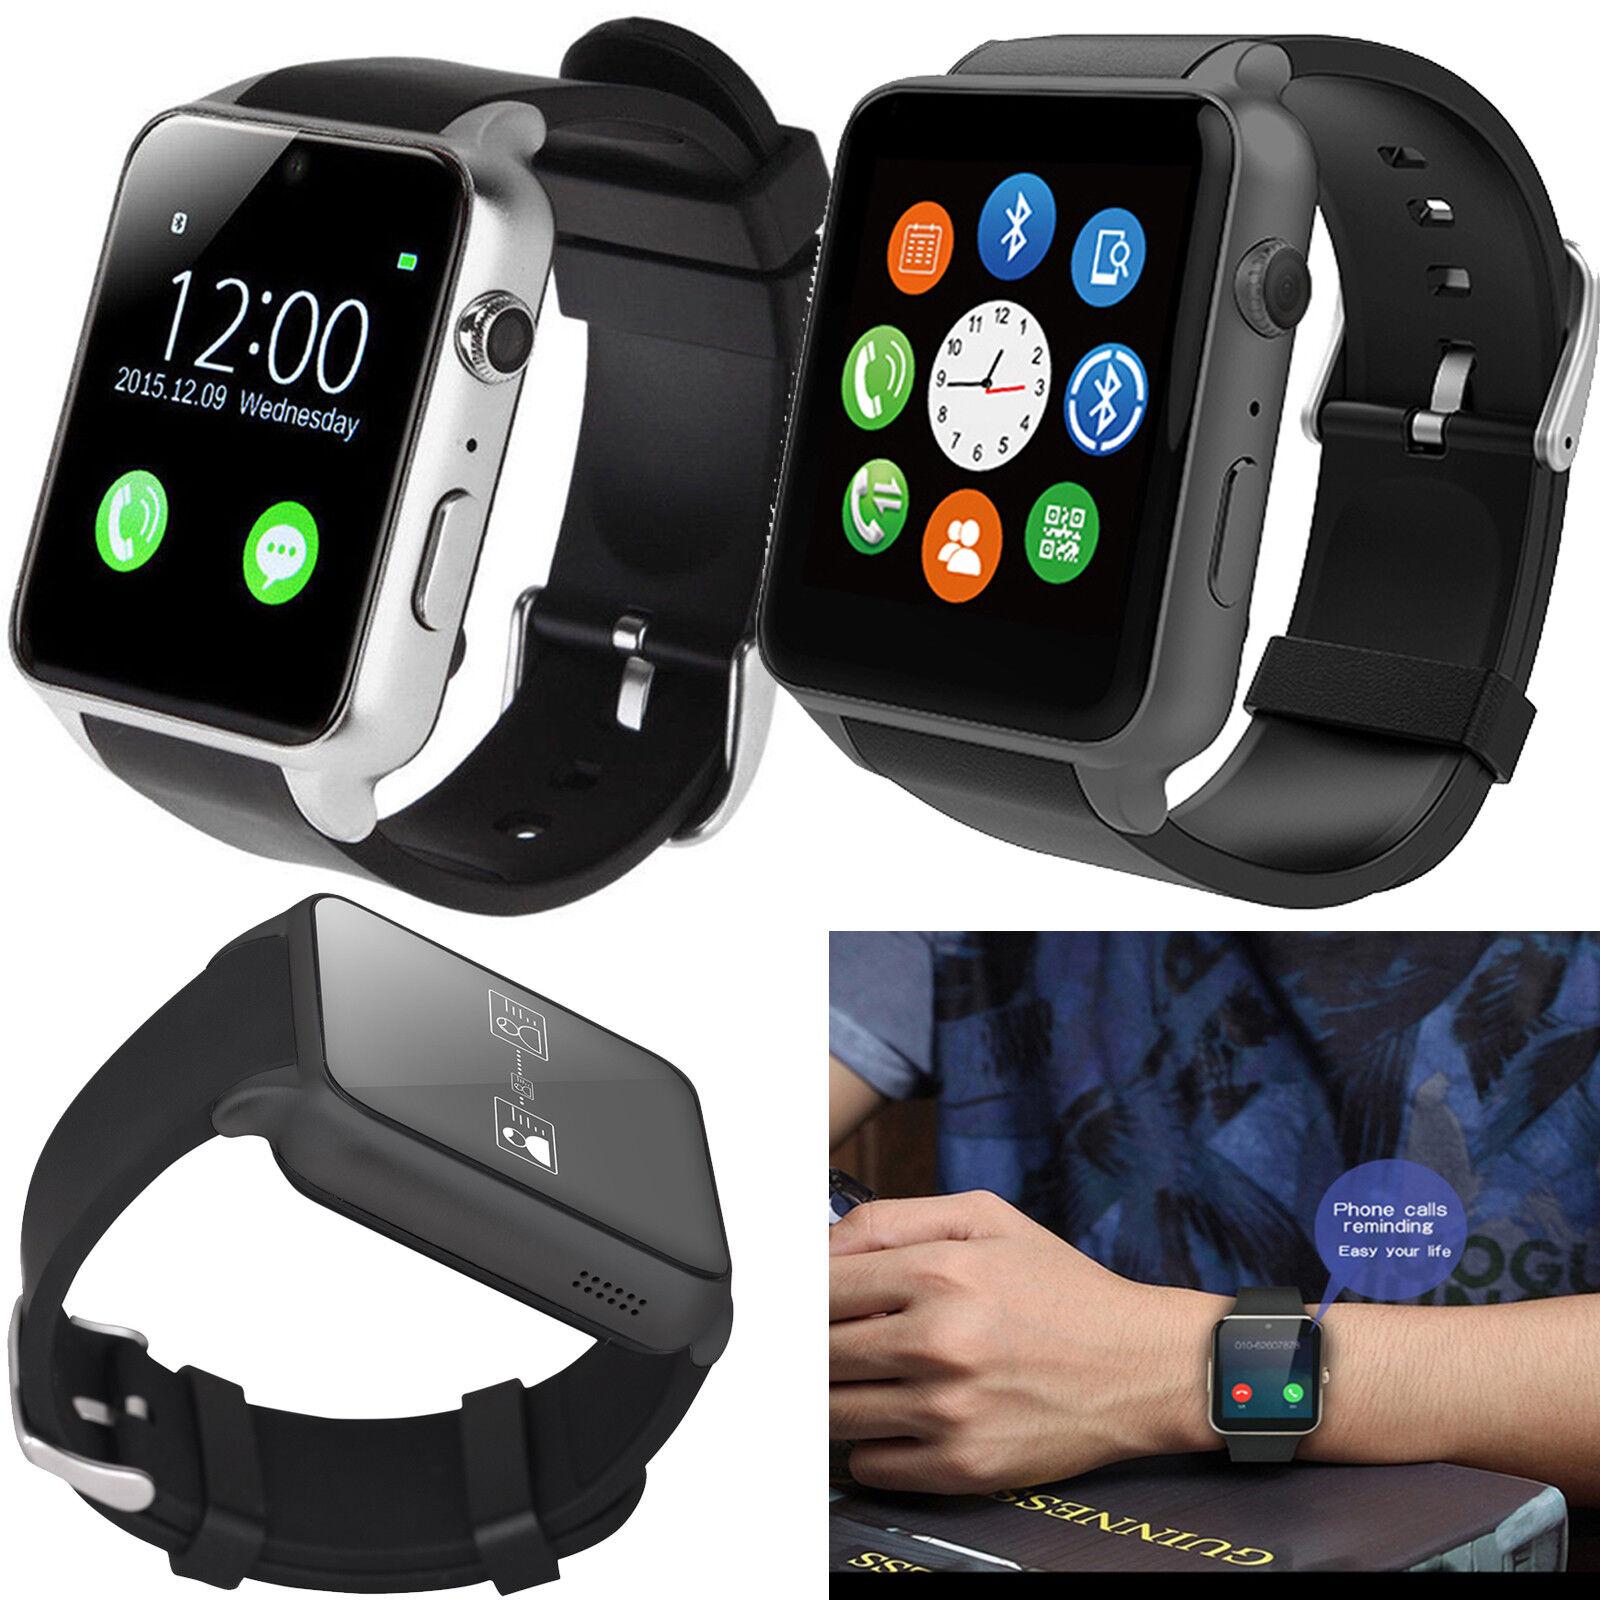 Bluetooth Smart Watch Phone Mate For Men Womens Samsung Note 9 8 LG G6 G7 Huawei bluetooth Featured for mate men note phone samsung smart watch womens